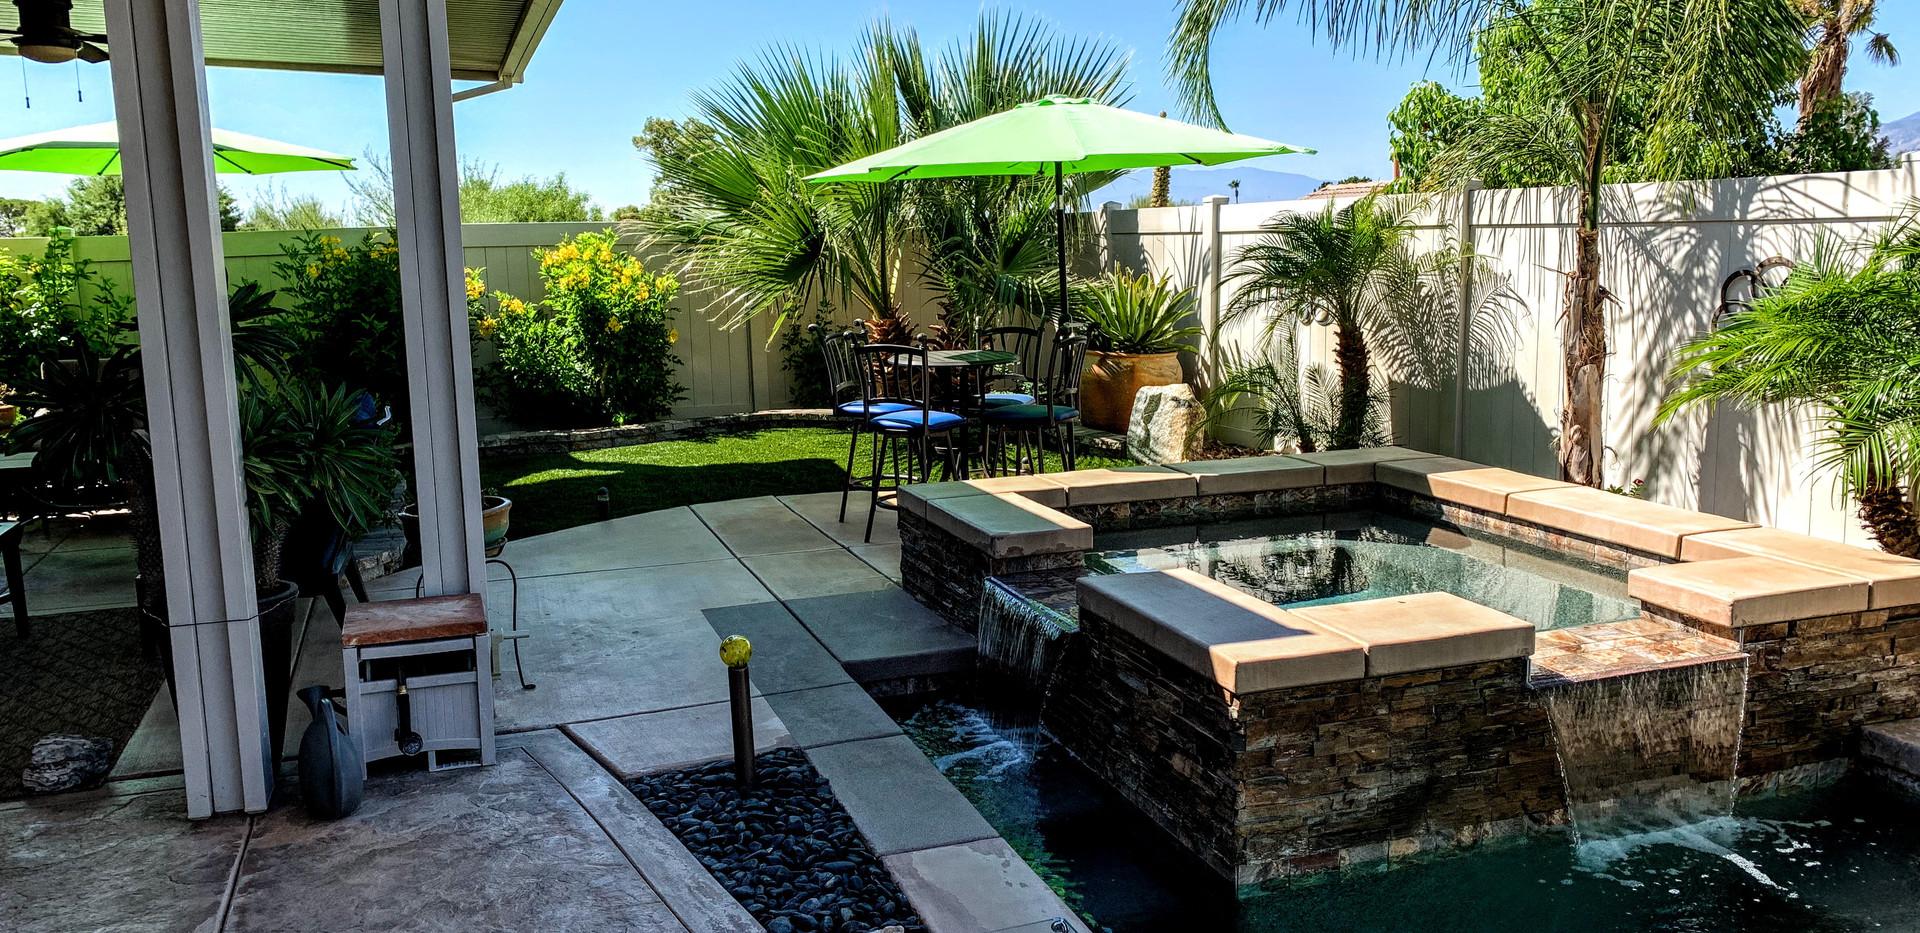 08-Yard-Pool-1.jpg